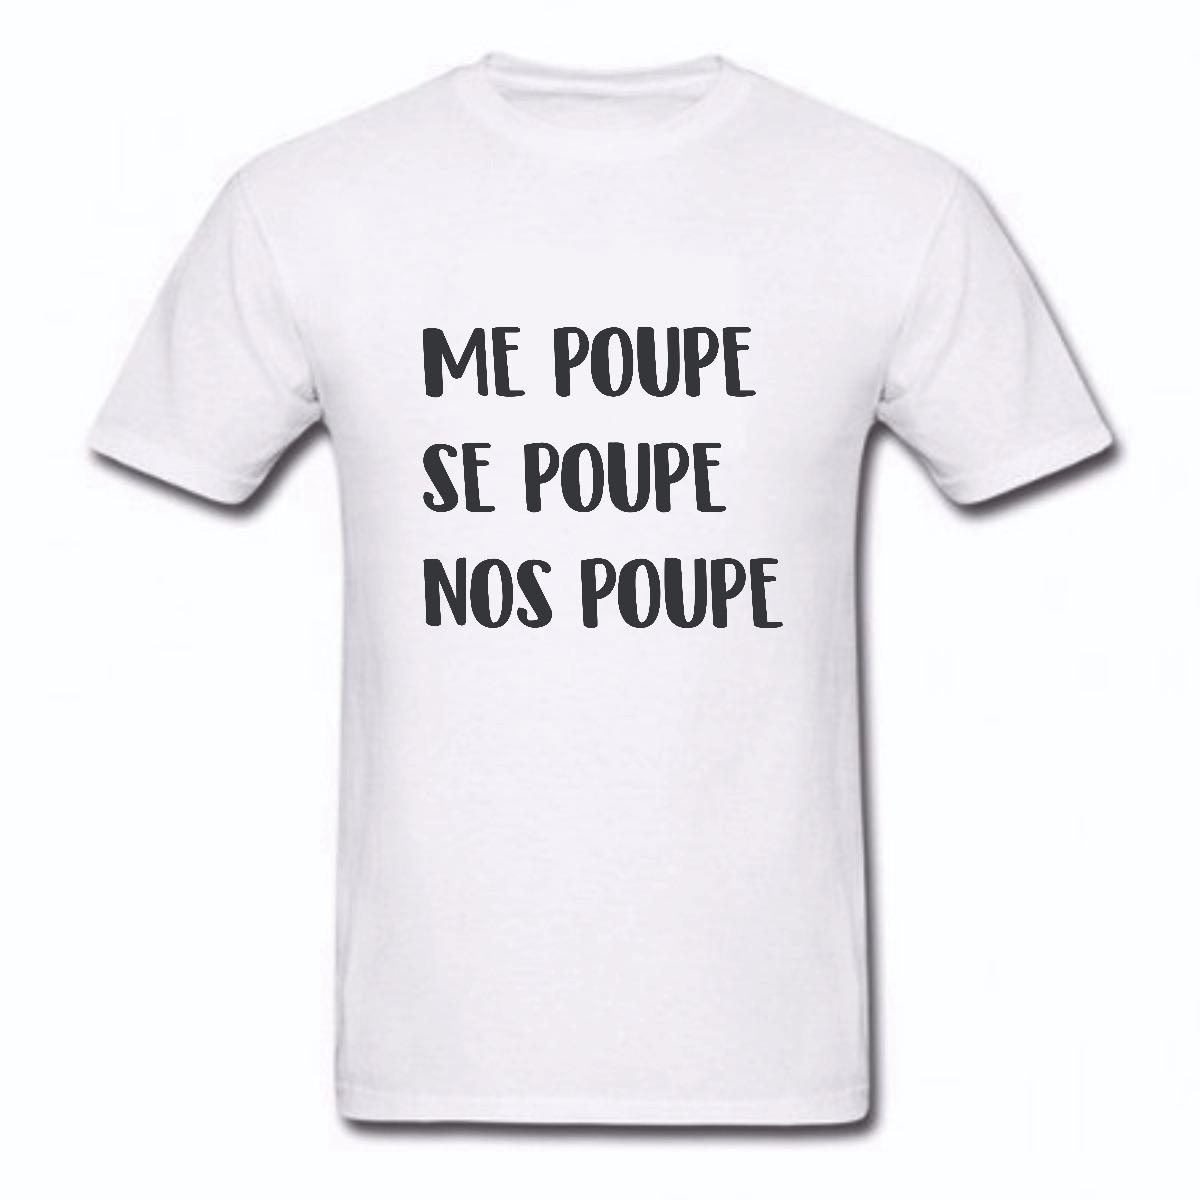 36638e1b0 Camisa Me Poupe